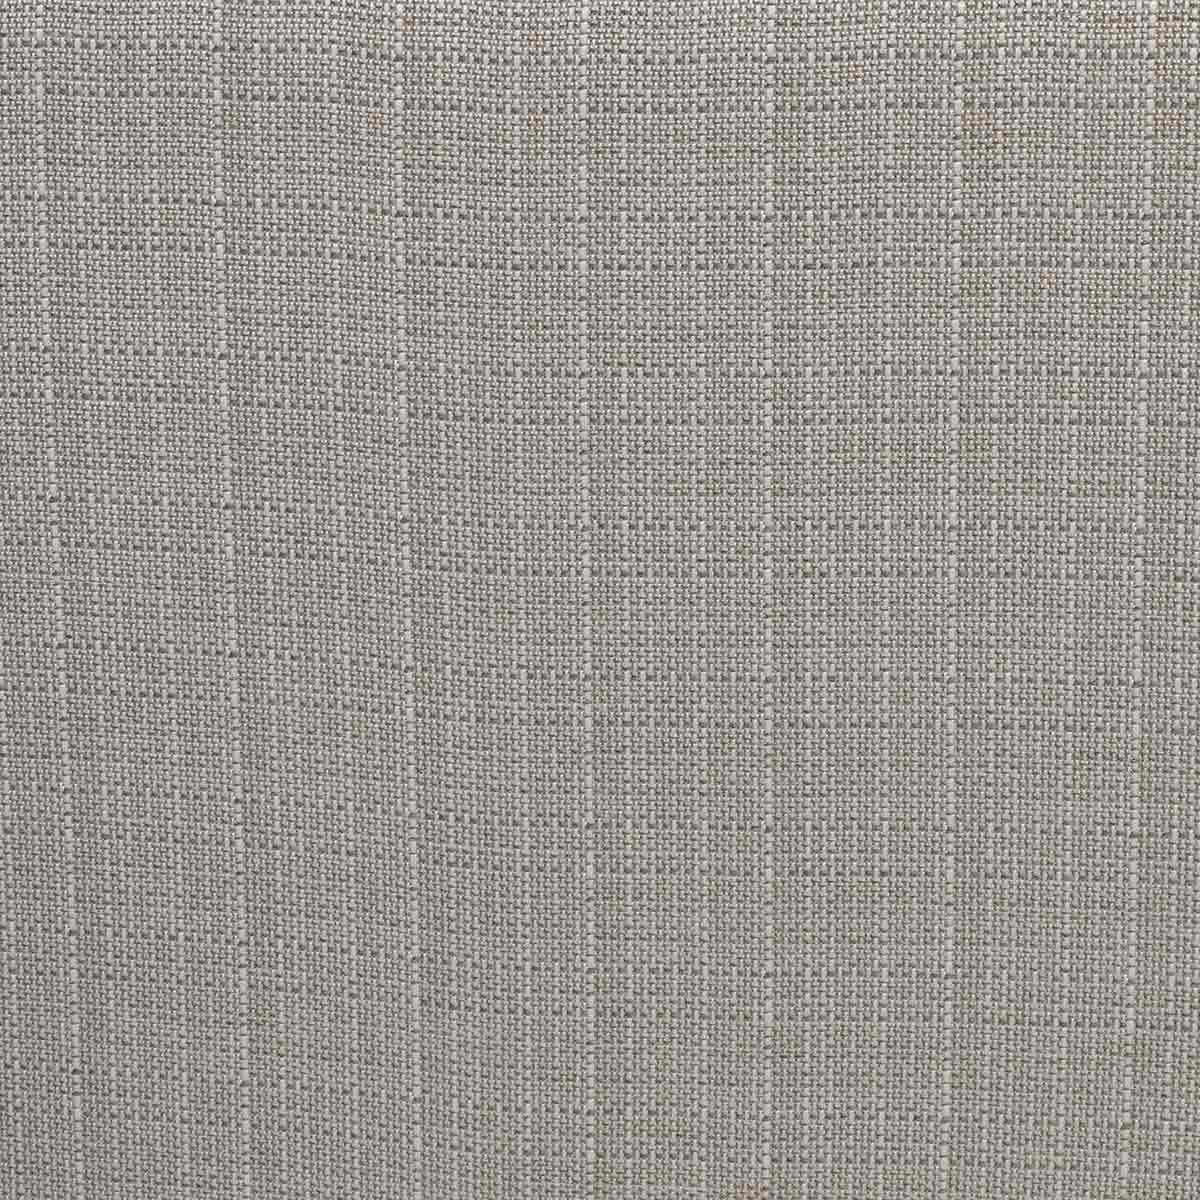 Hillsdale Lani Vanity Stool - Gray